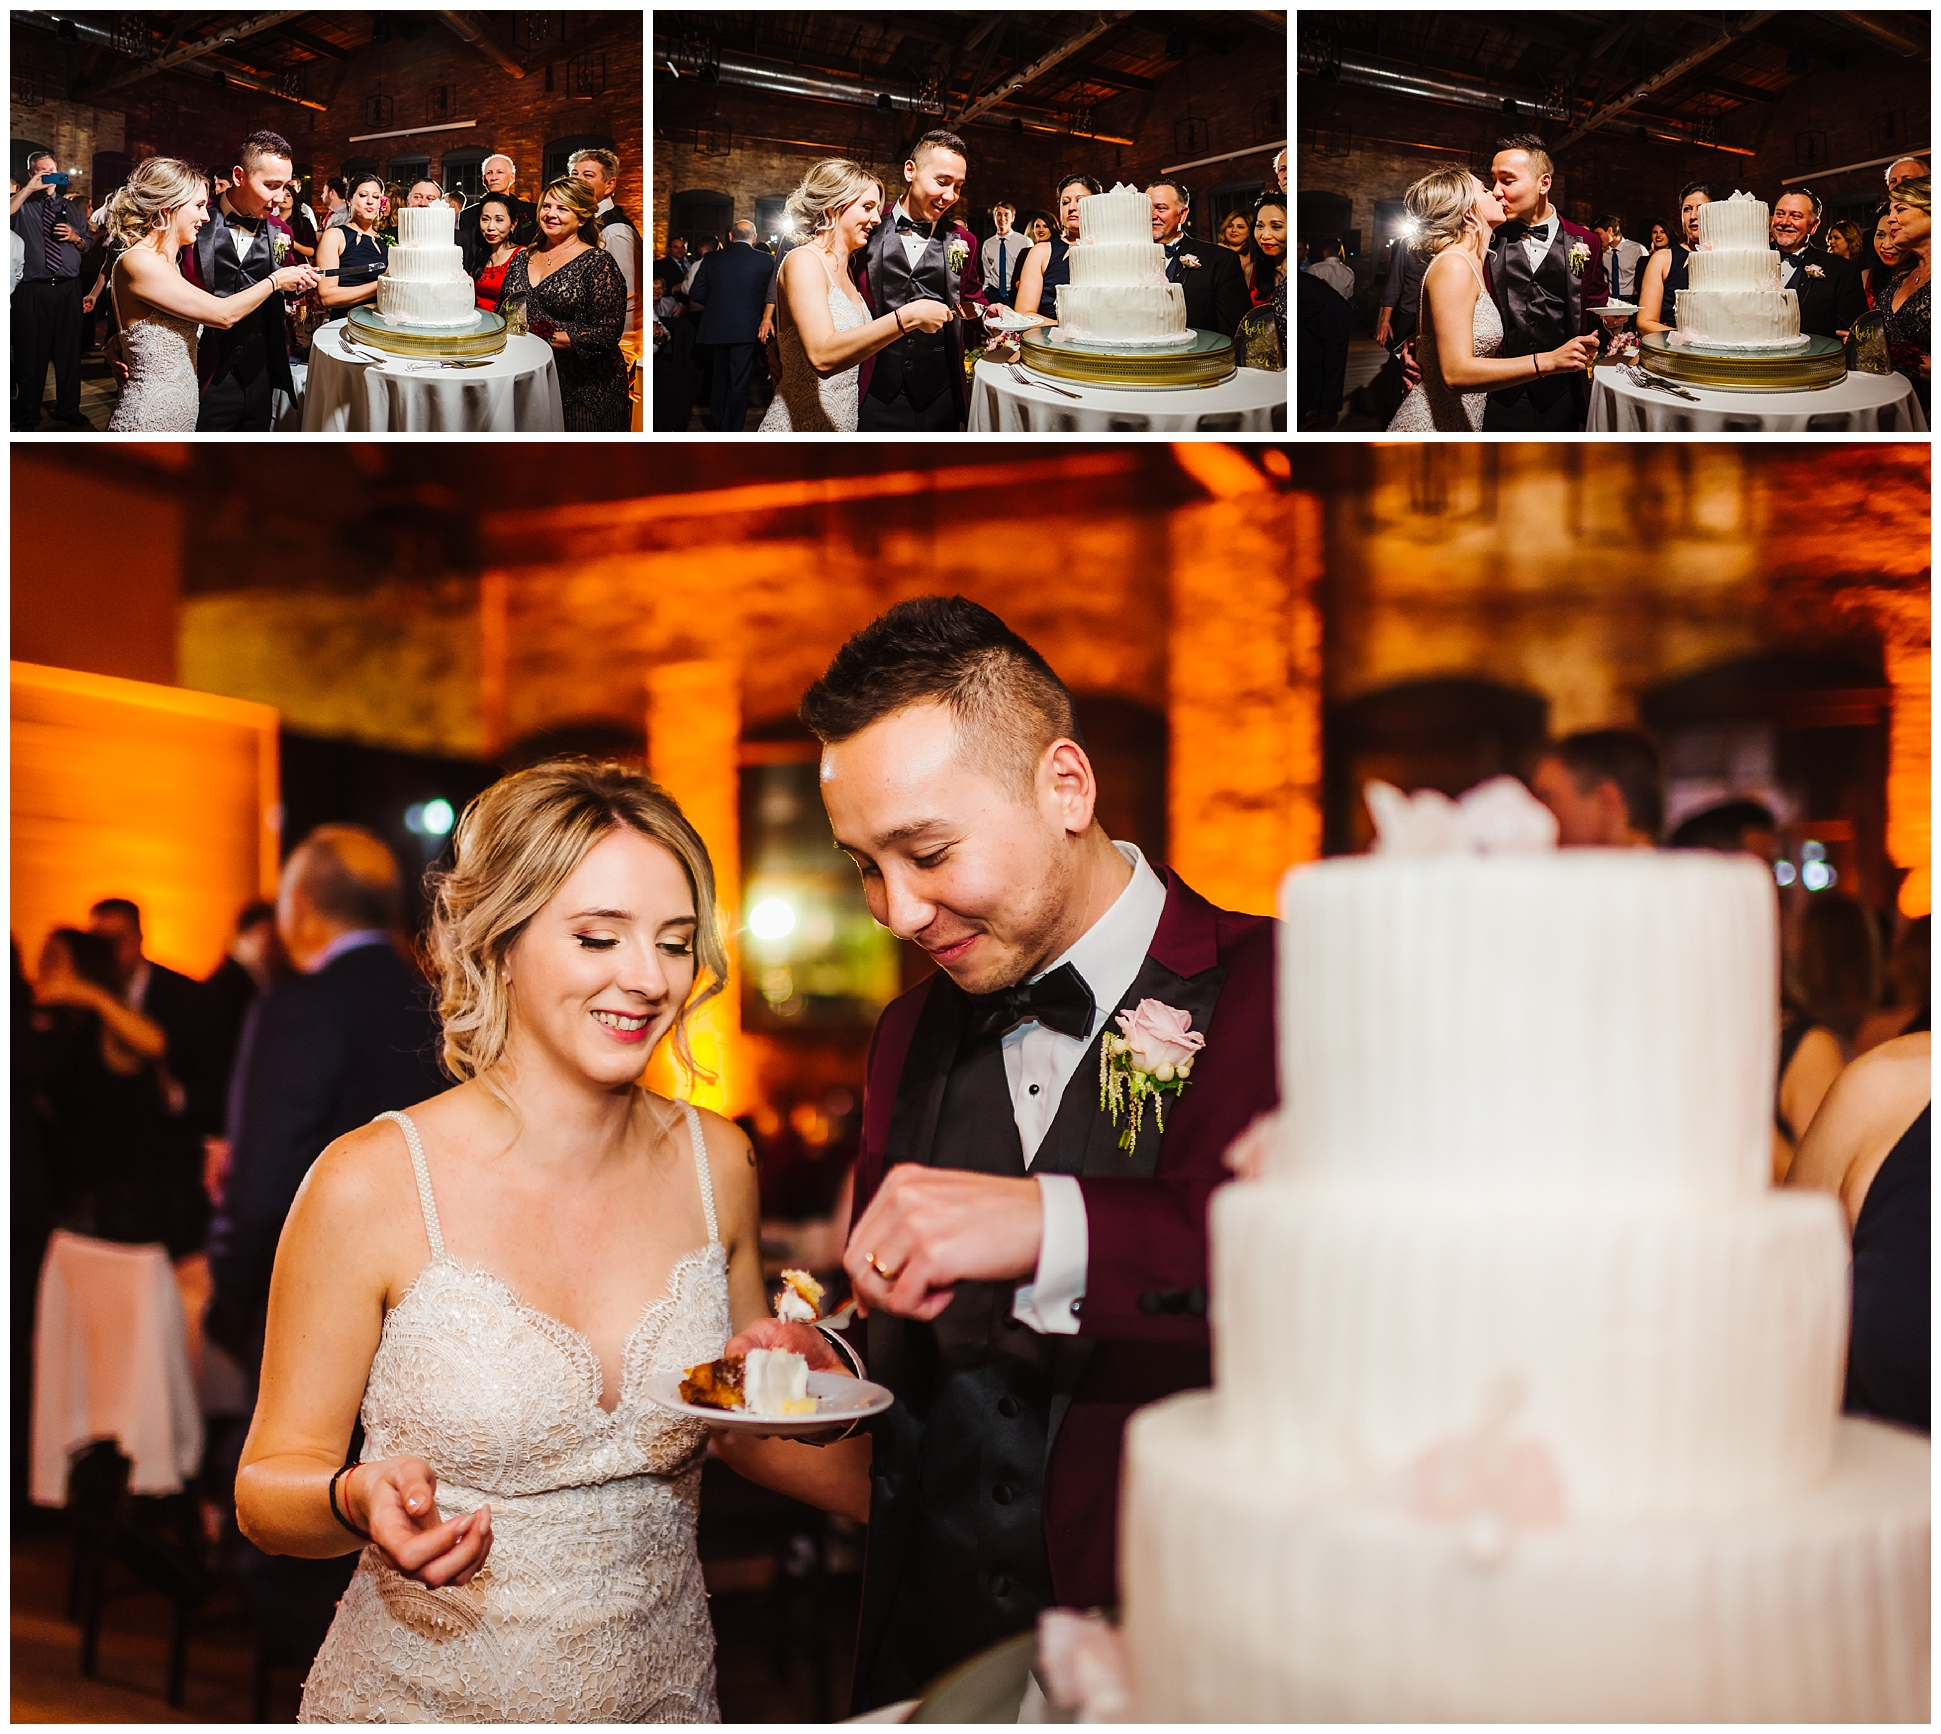 tampa-armeture-wedding-photographer-edgy-industrial-downtown-fancy-free-nursery-tattoo-burgandy-velvet_0079.jpg